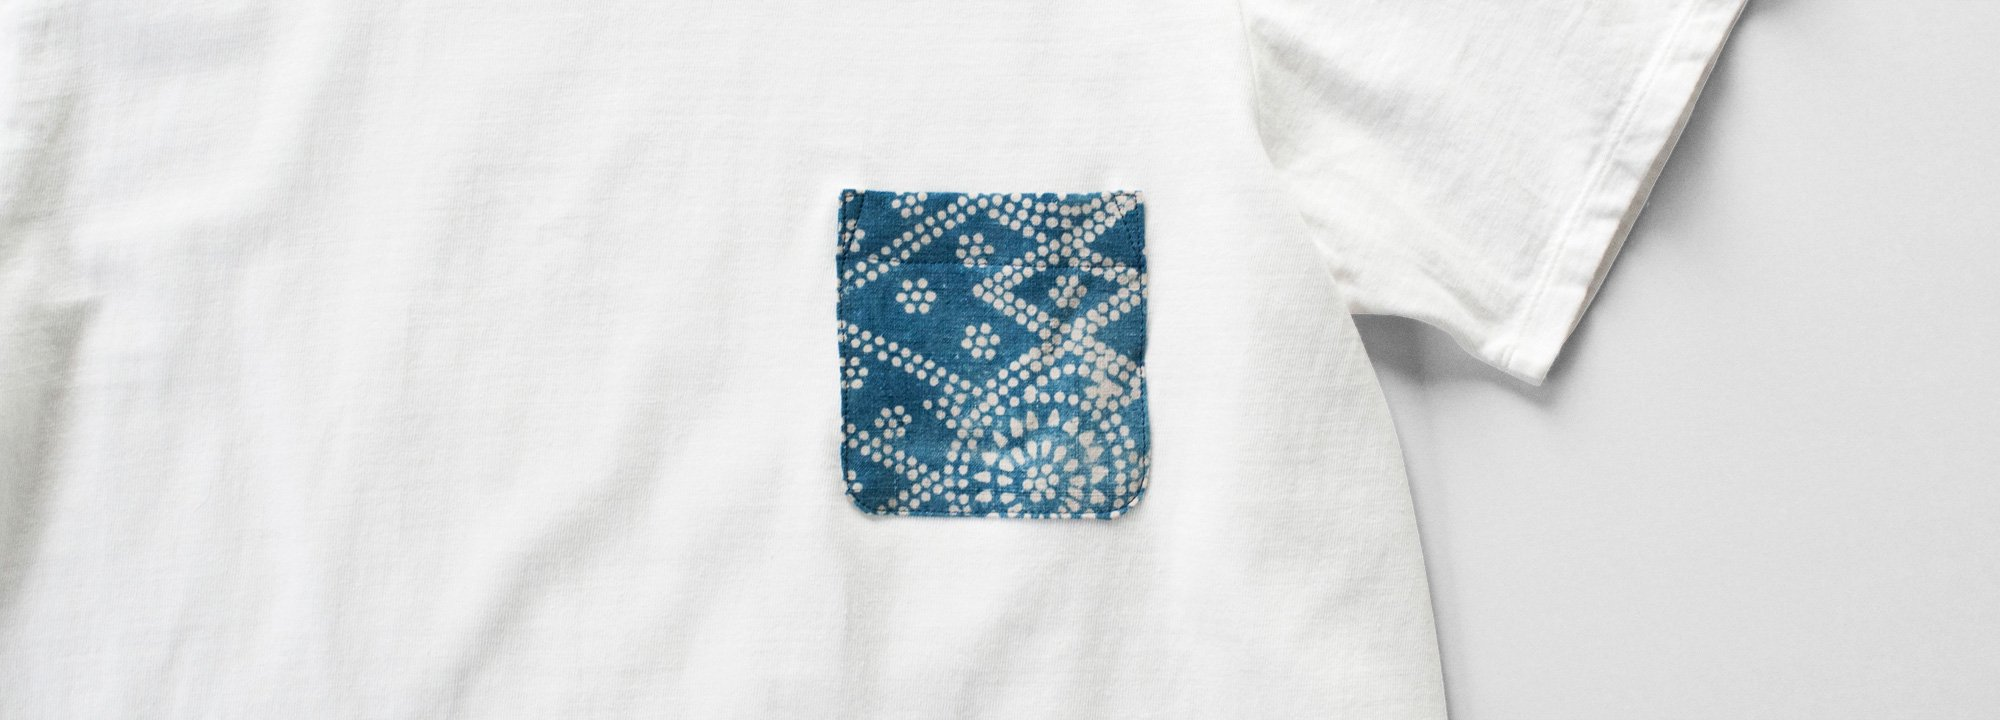 Organic Cotton Antique Pocket